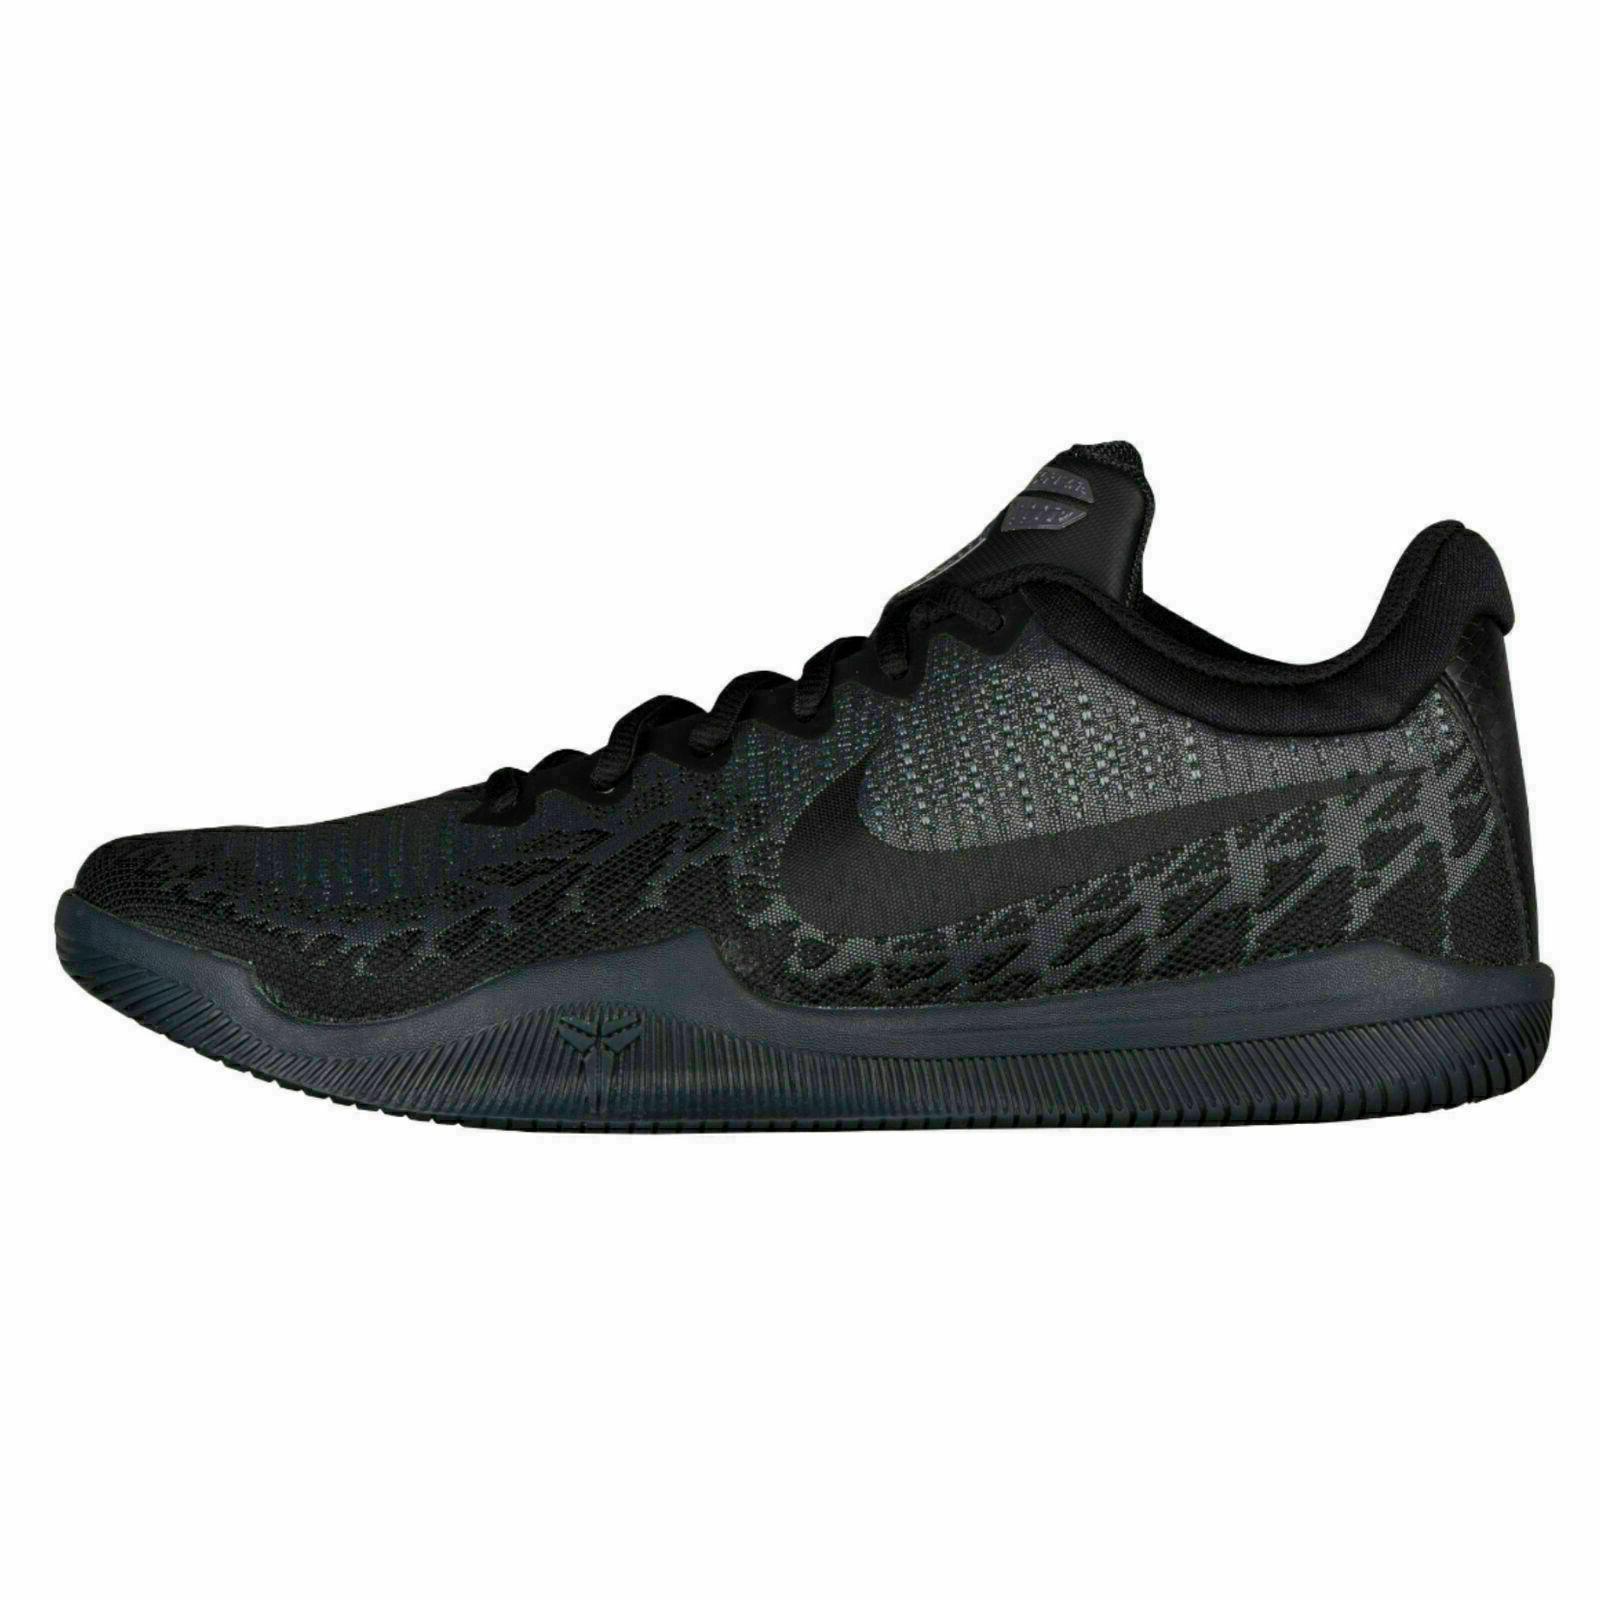 mamba rage mens basketball shoes 908972 002